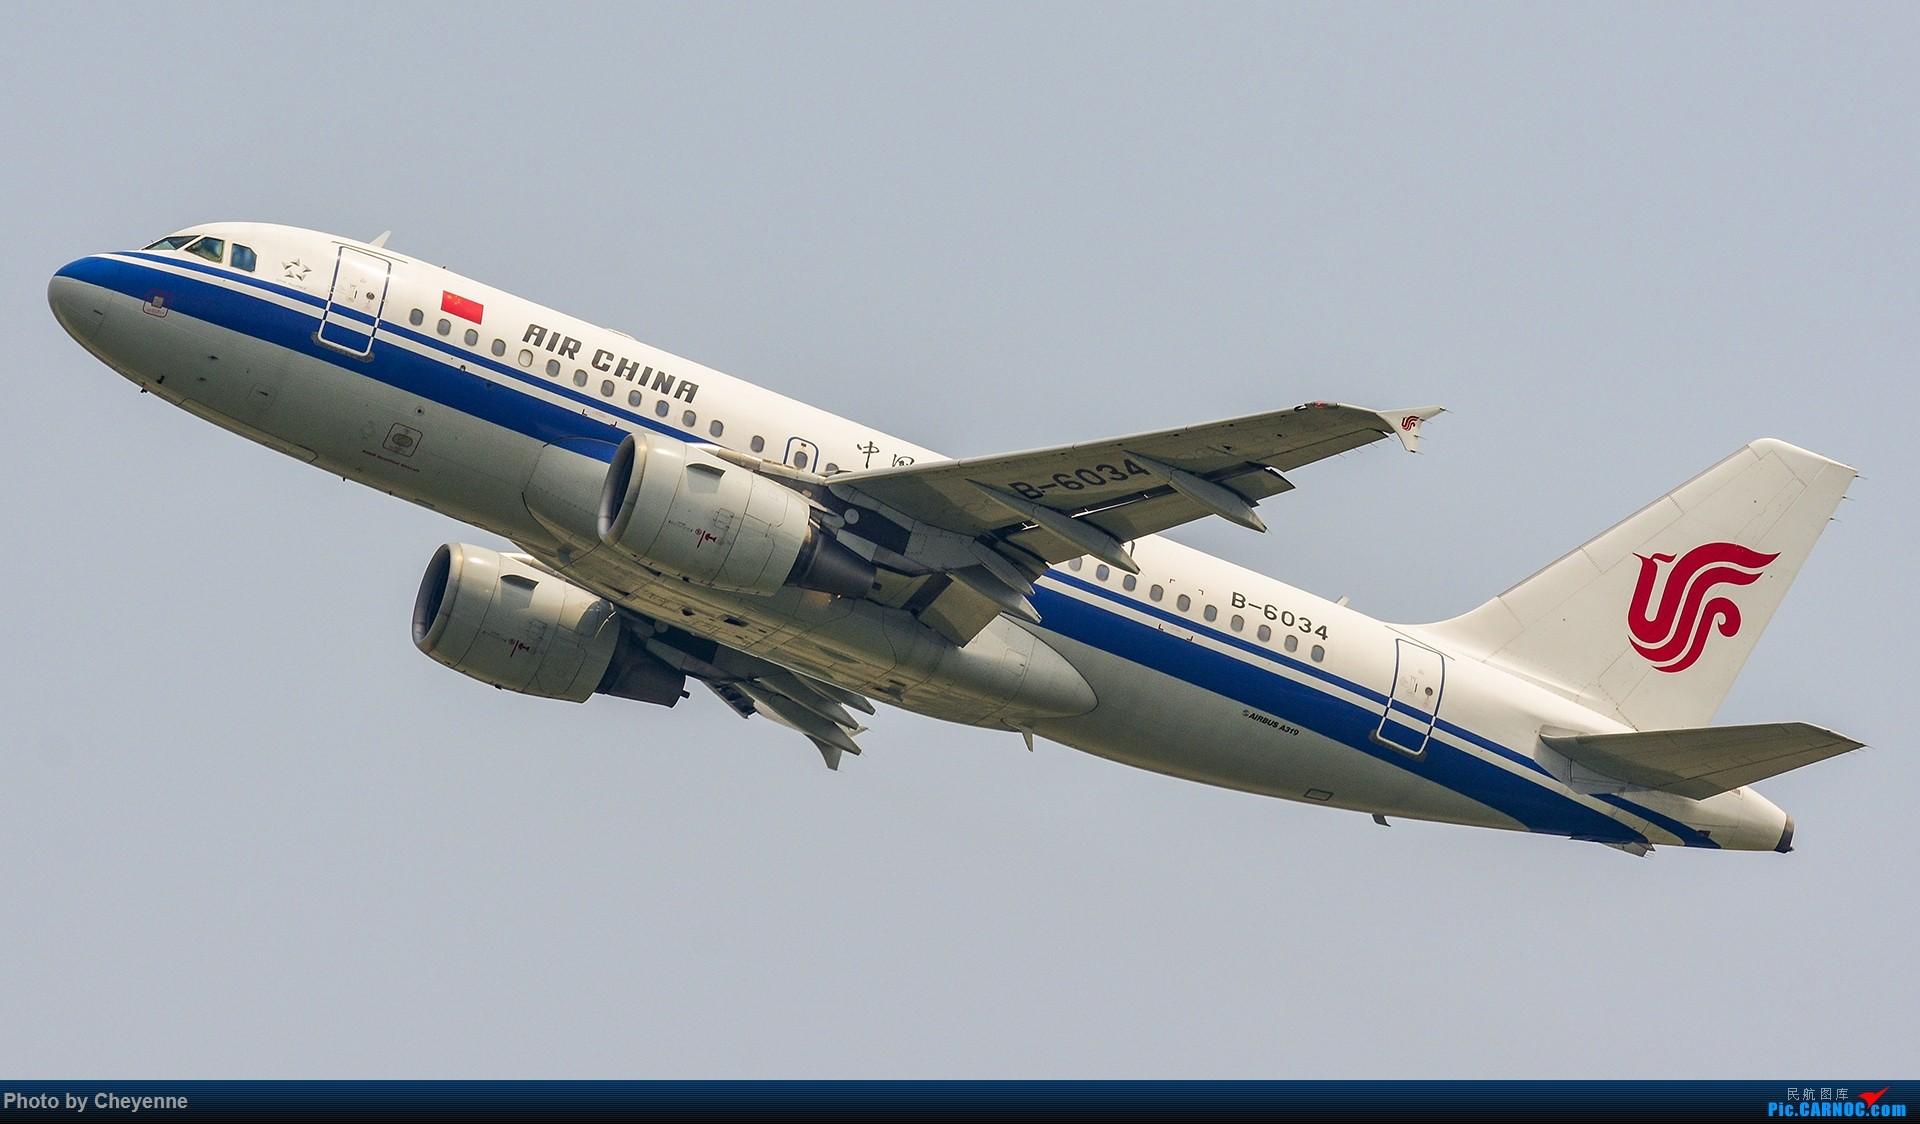 Re:[原创]蓉卢兹之日常 AIRBUS A319-100 B-6034 中国成都双流国际机场